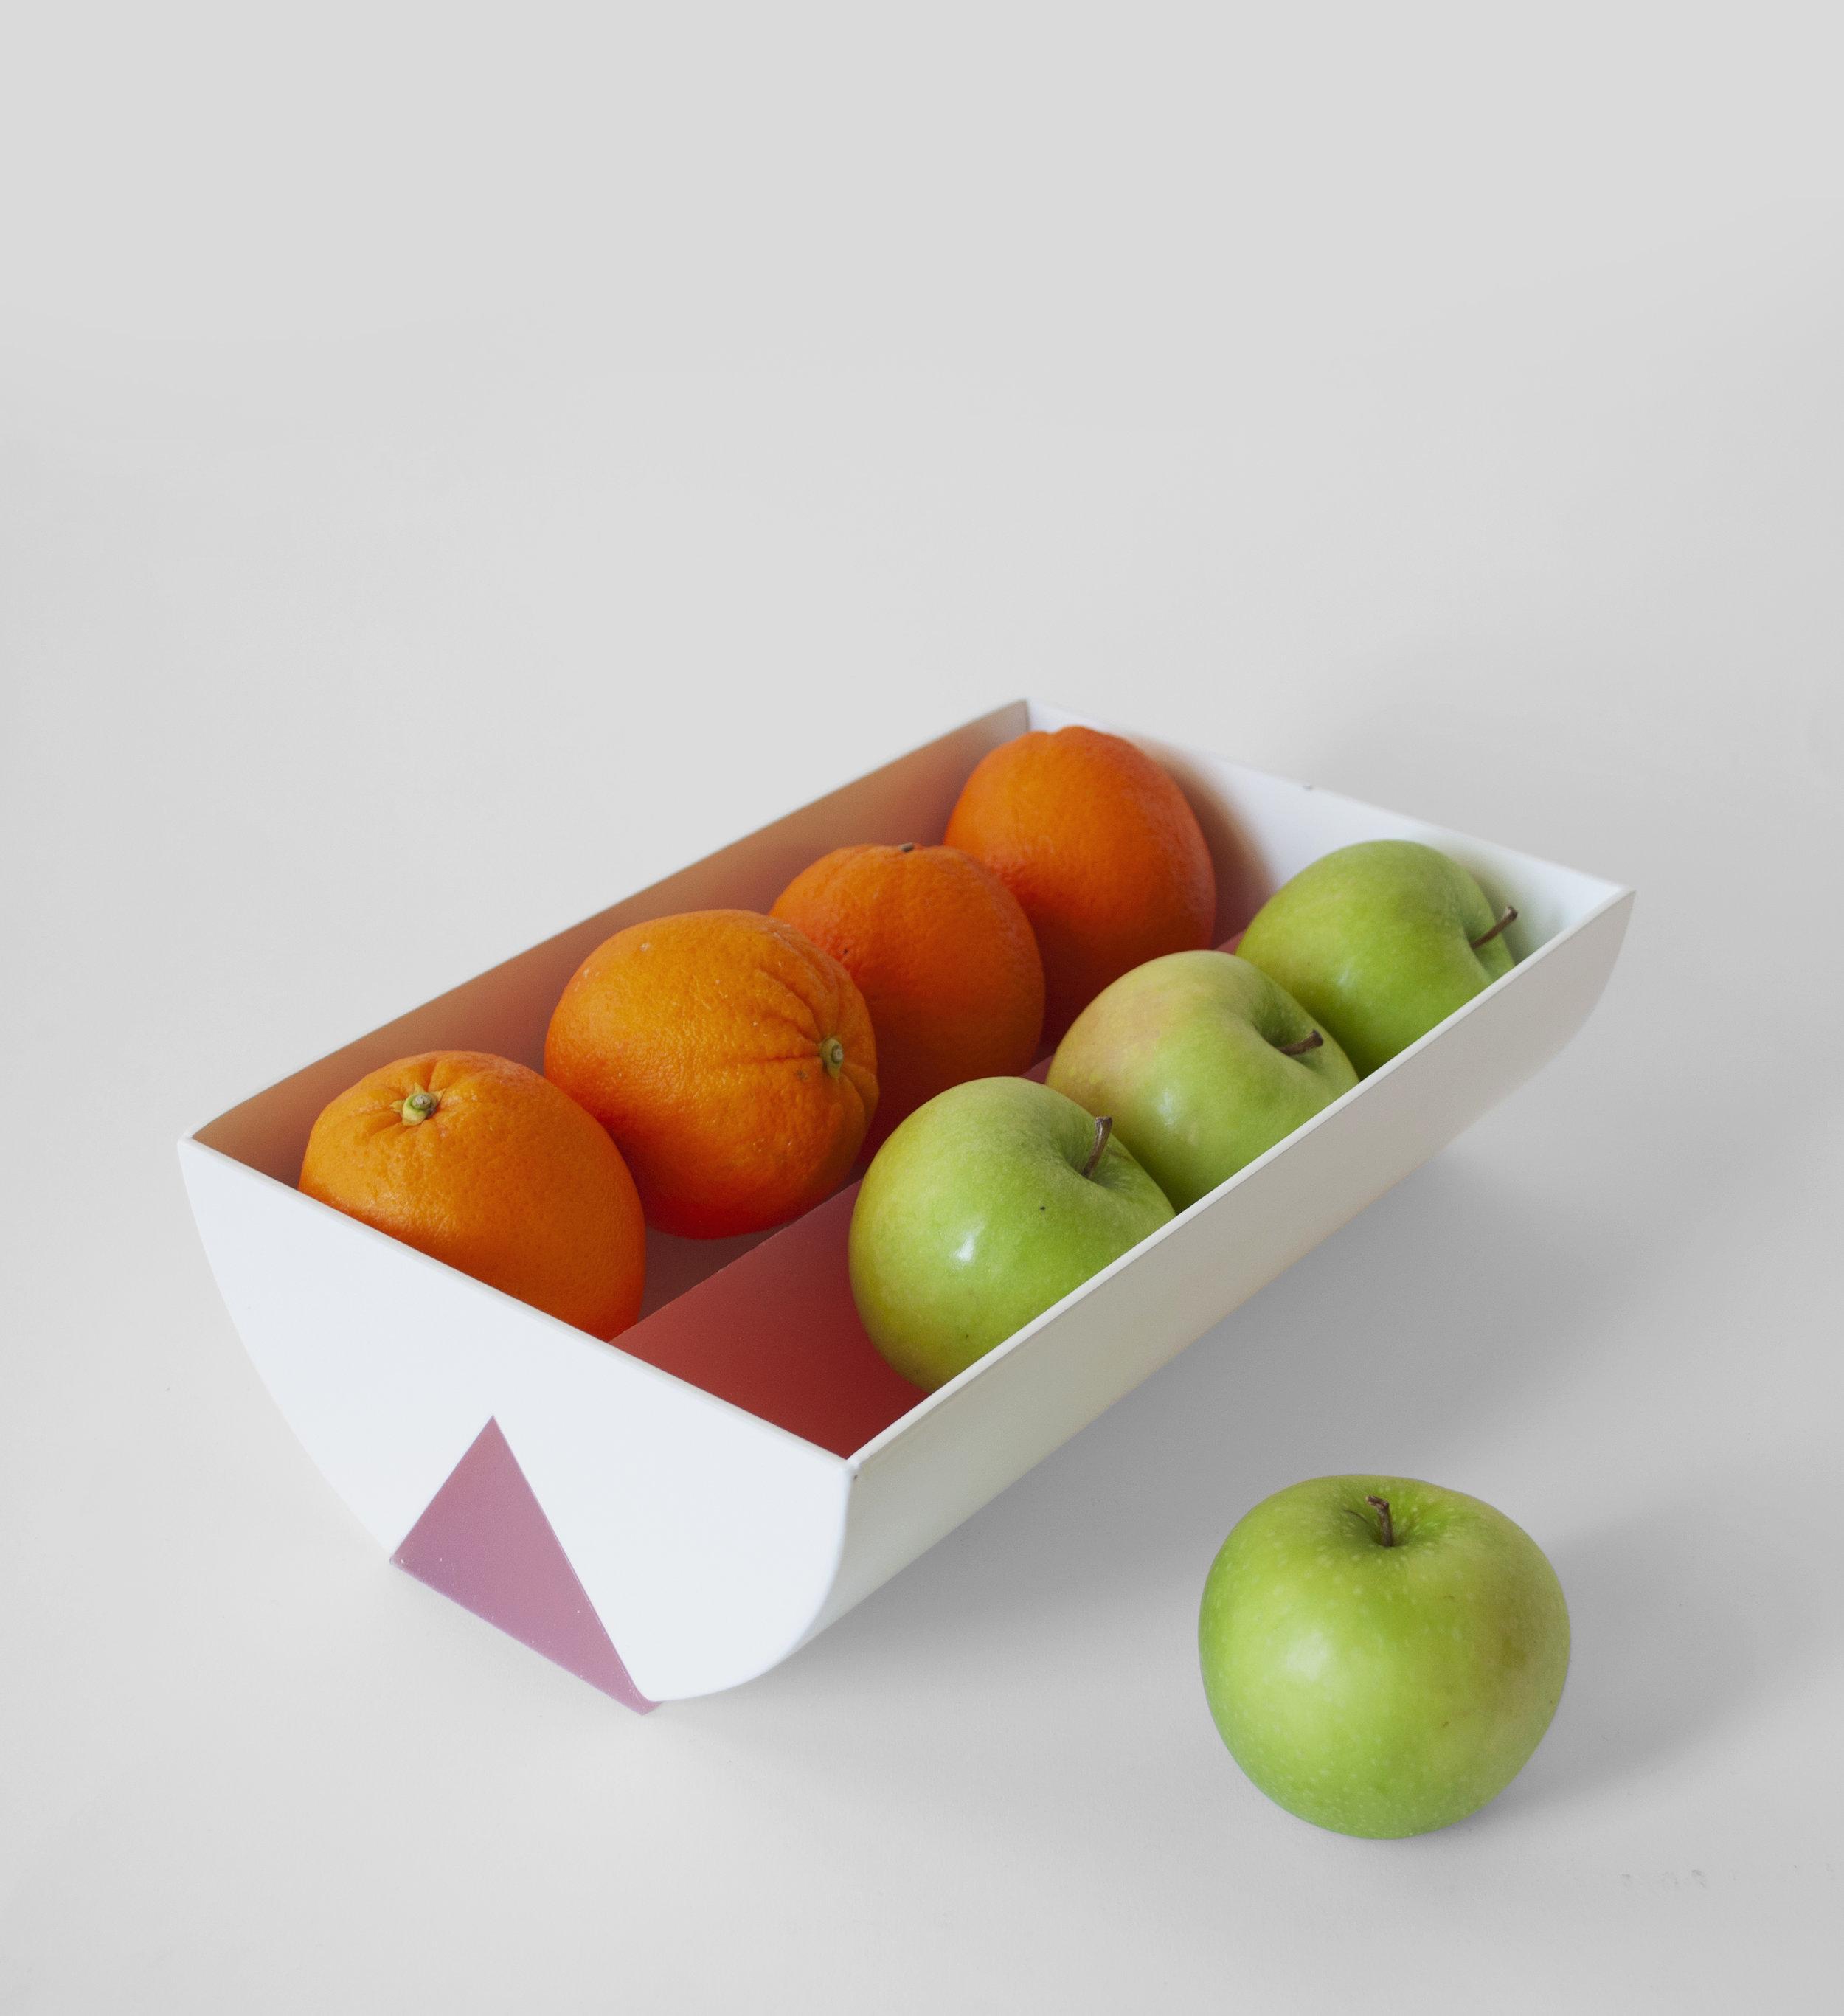 fruit bowl photo 2.jpg